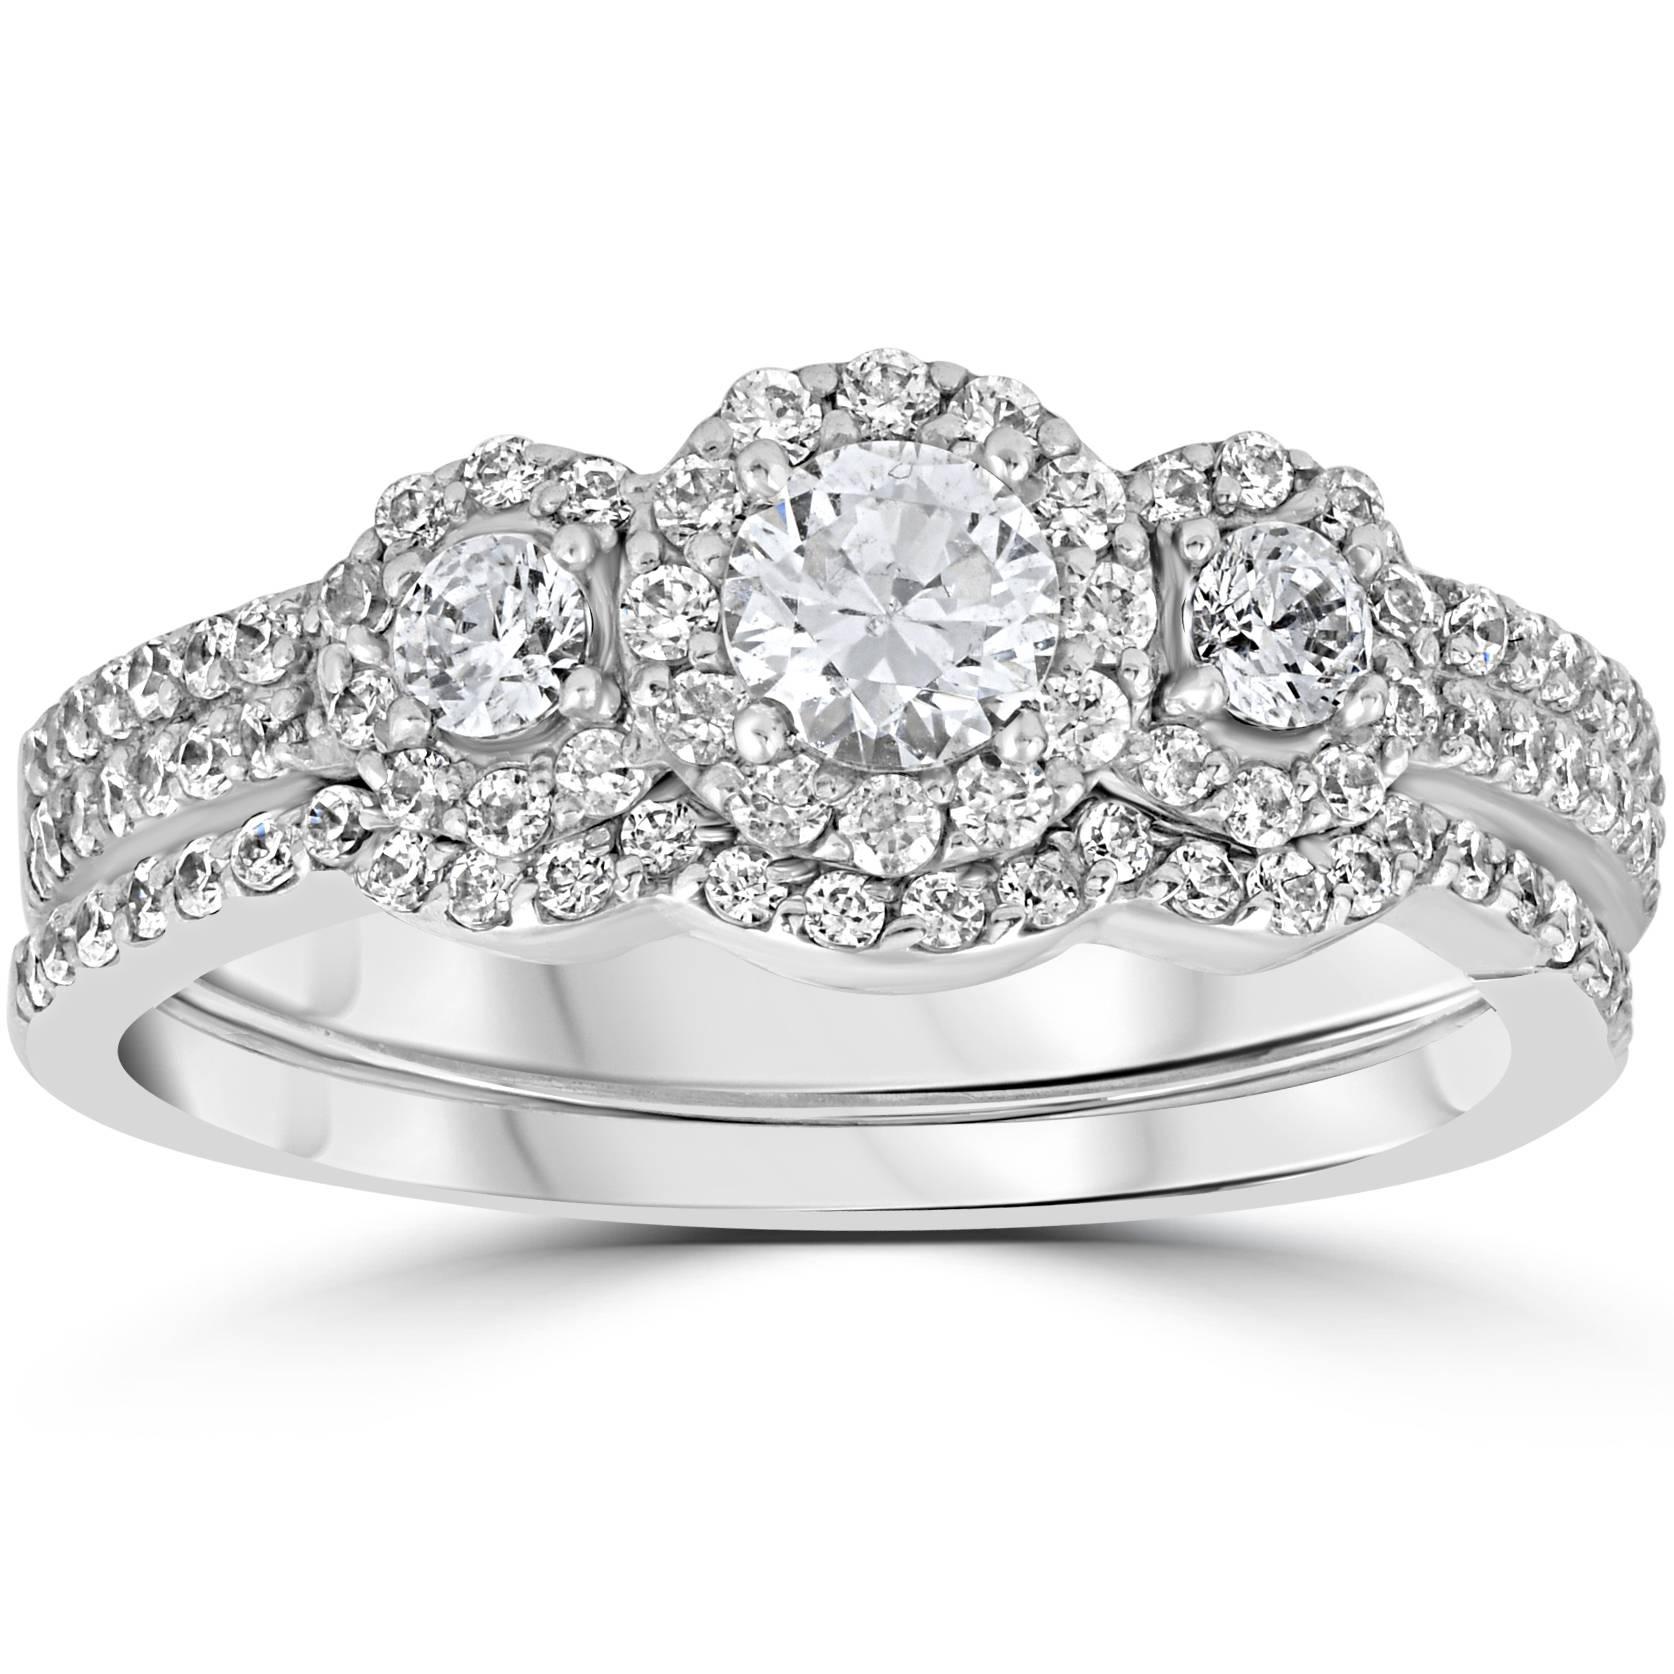 3 stone diamond engagement wedding ring set 10k. Black Bedroom Furniture Sets. Home Design Ideas